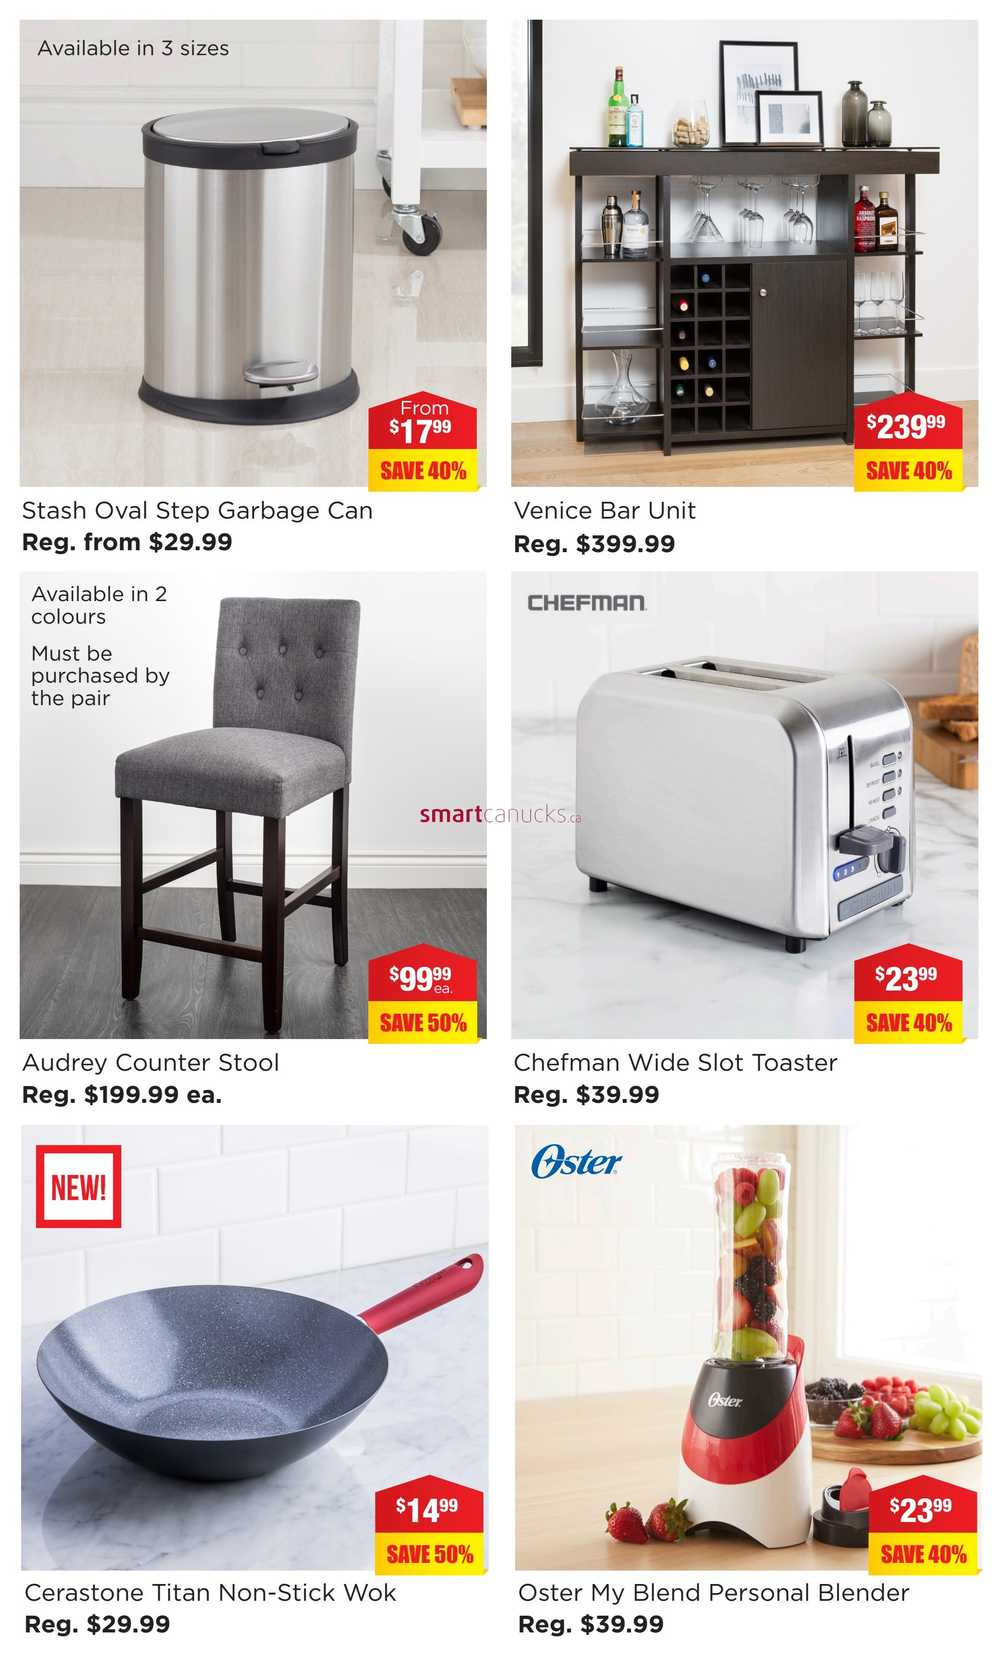 Kitchen Stuff Plus Red Hot Deals Flyer April 9 to 15